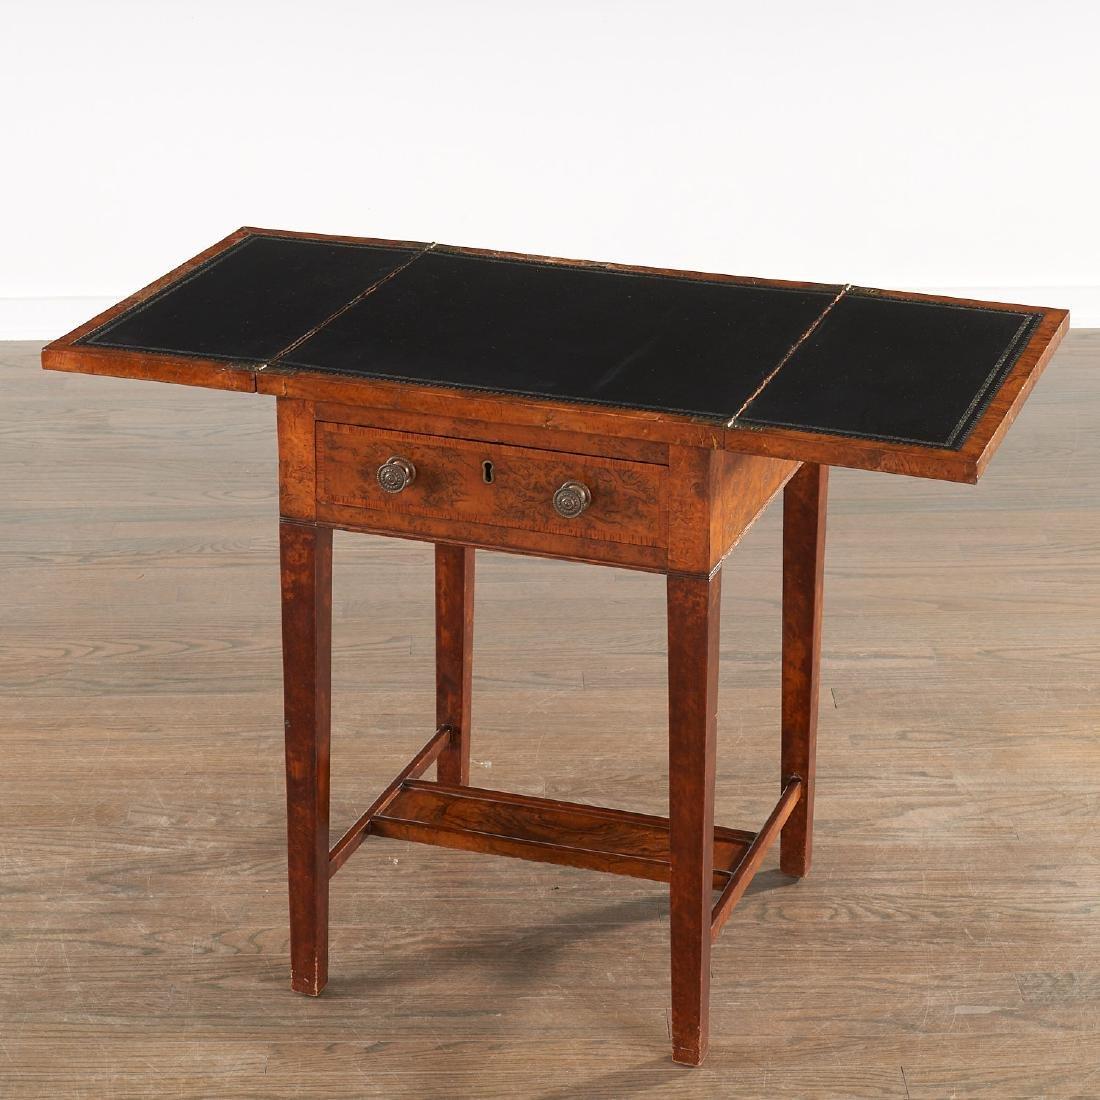 Antique Hepplewhite writing table - 5